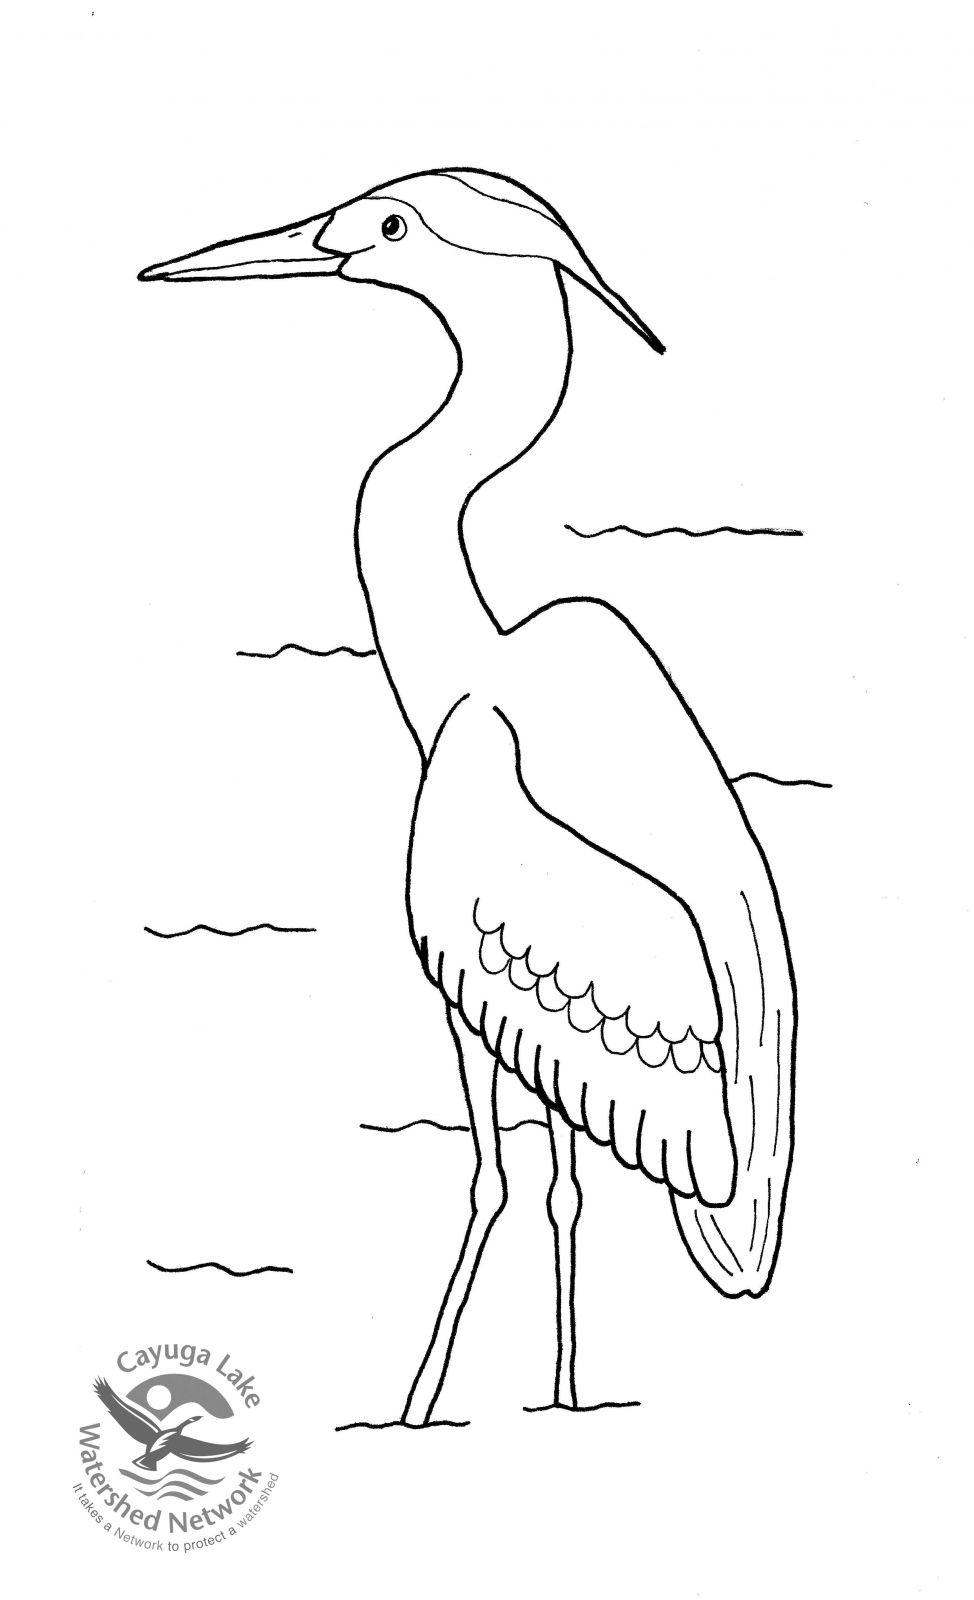 Heron Coloring Pages For Kids Heron Coloring Pages Printable Coloring Pages For Kids Blue Heron Heron